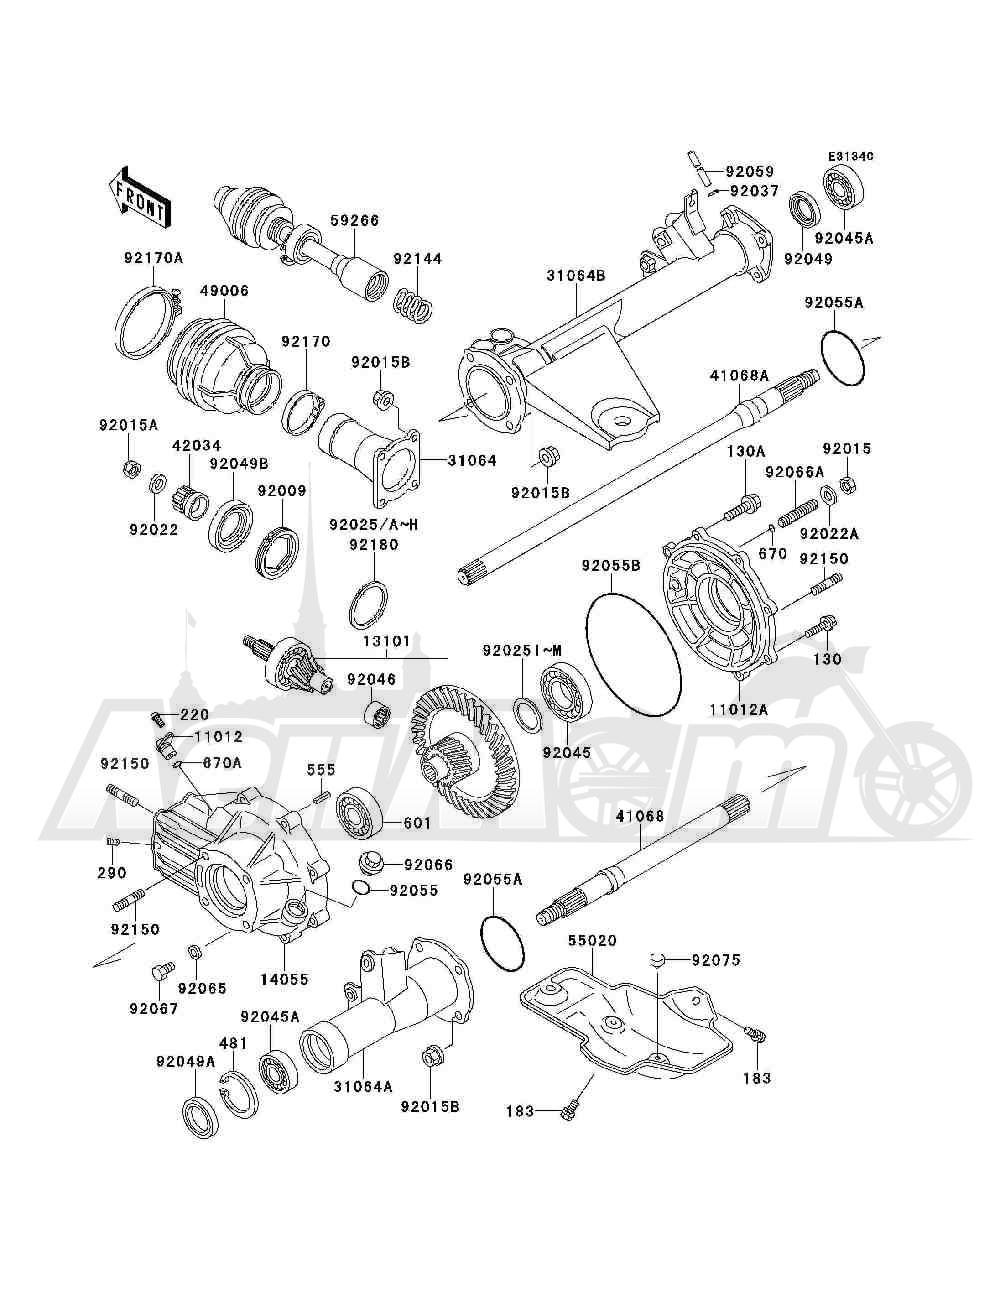 Запчасти для Квадроцикла Kawasaki 1994 BAYOU 300 4X4 (KLF300-C6) Раздел: DRIVE SHAFT(REAR) | приводной вал (зад)